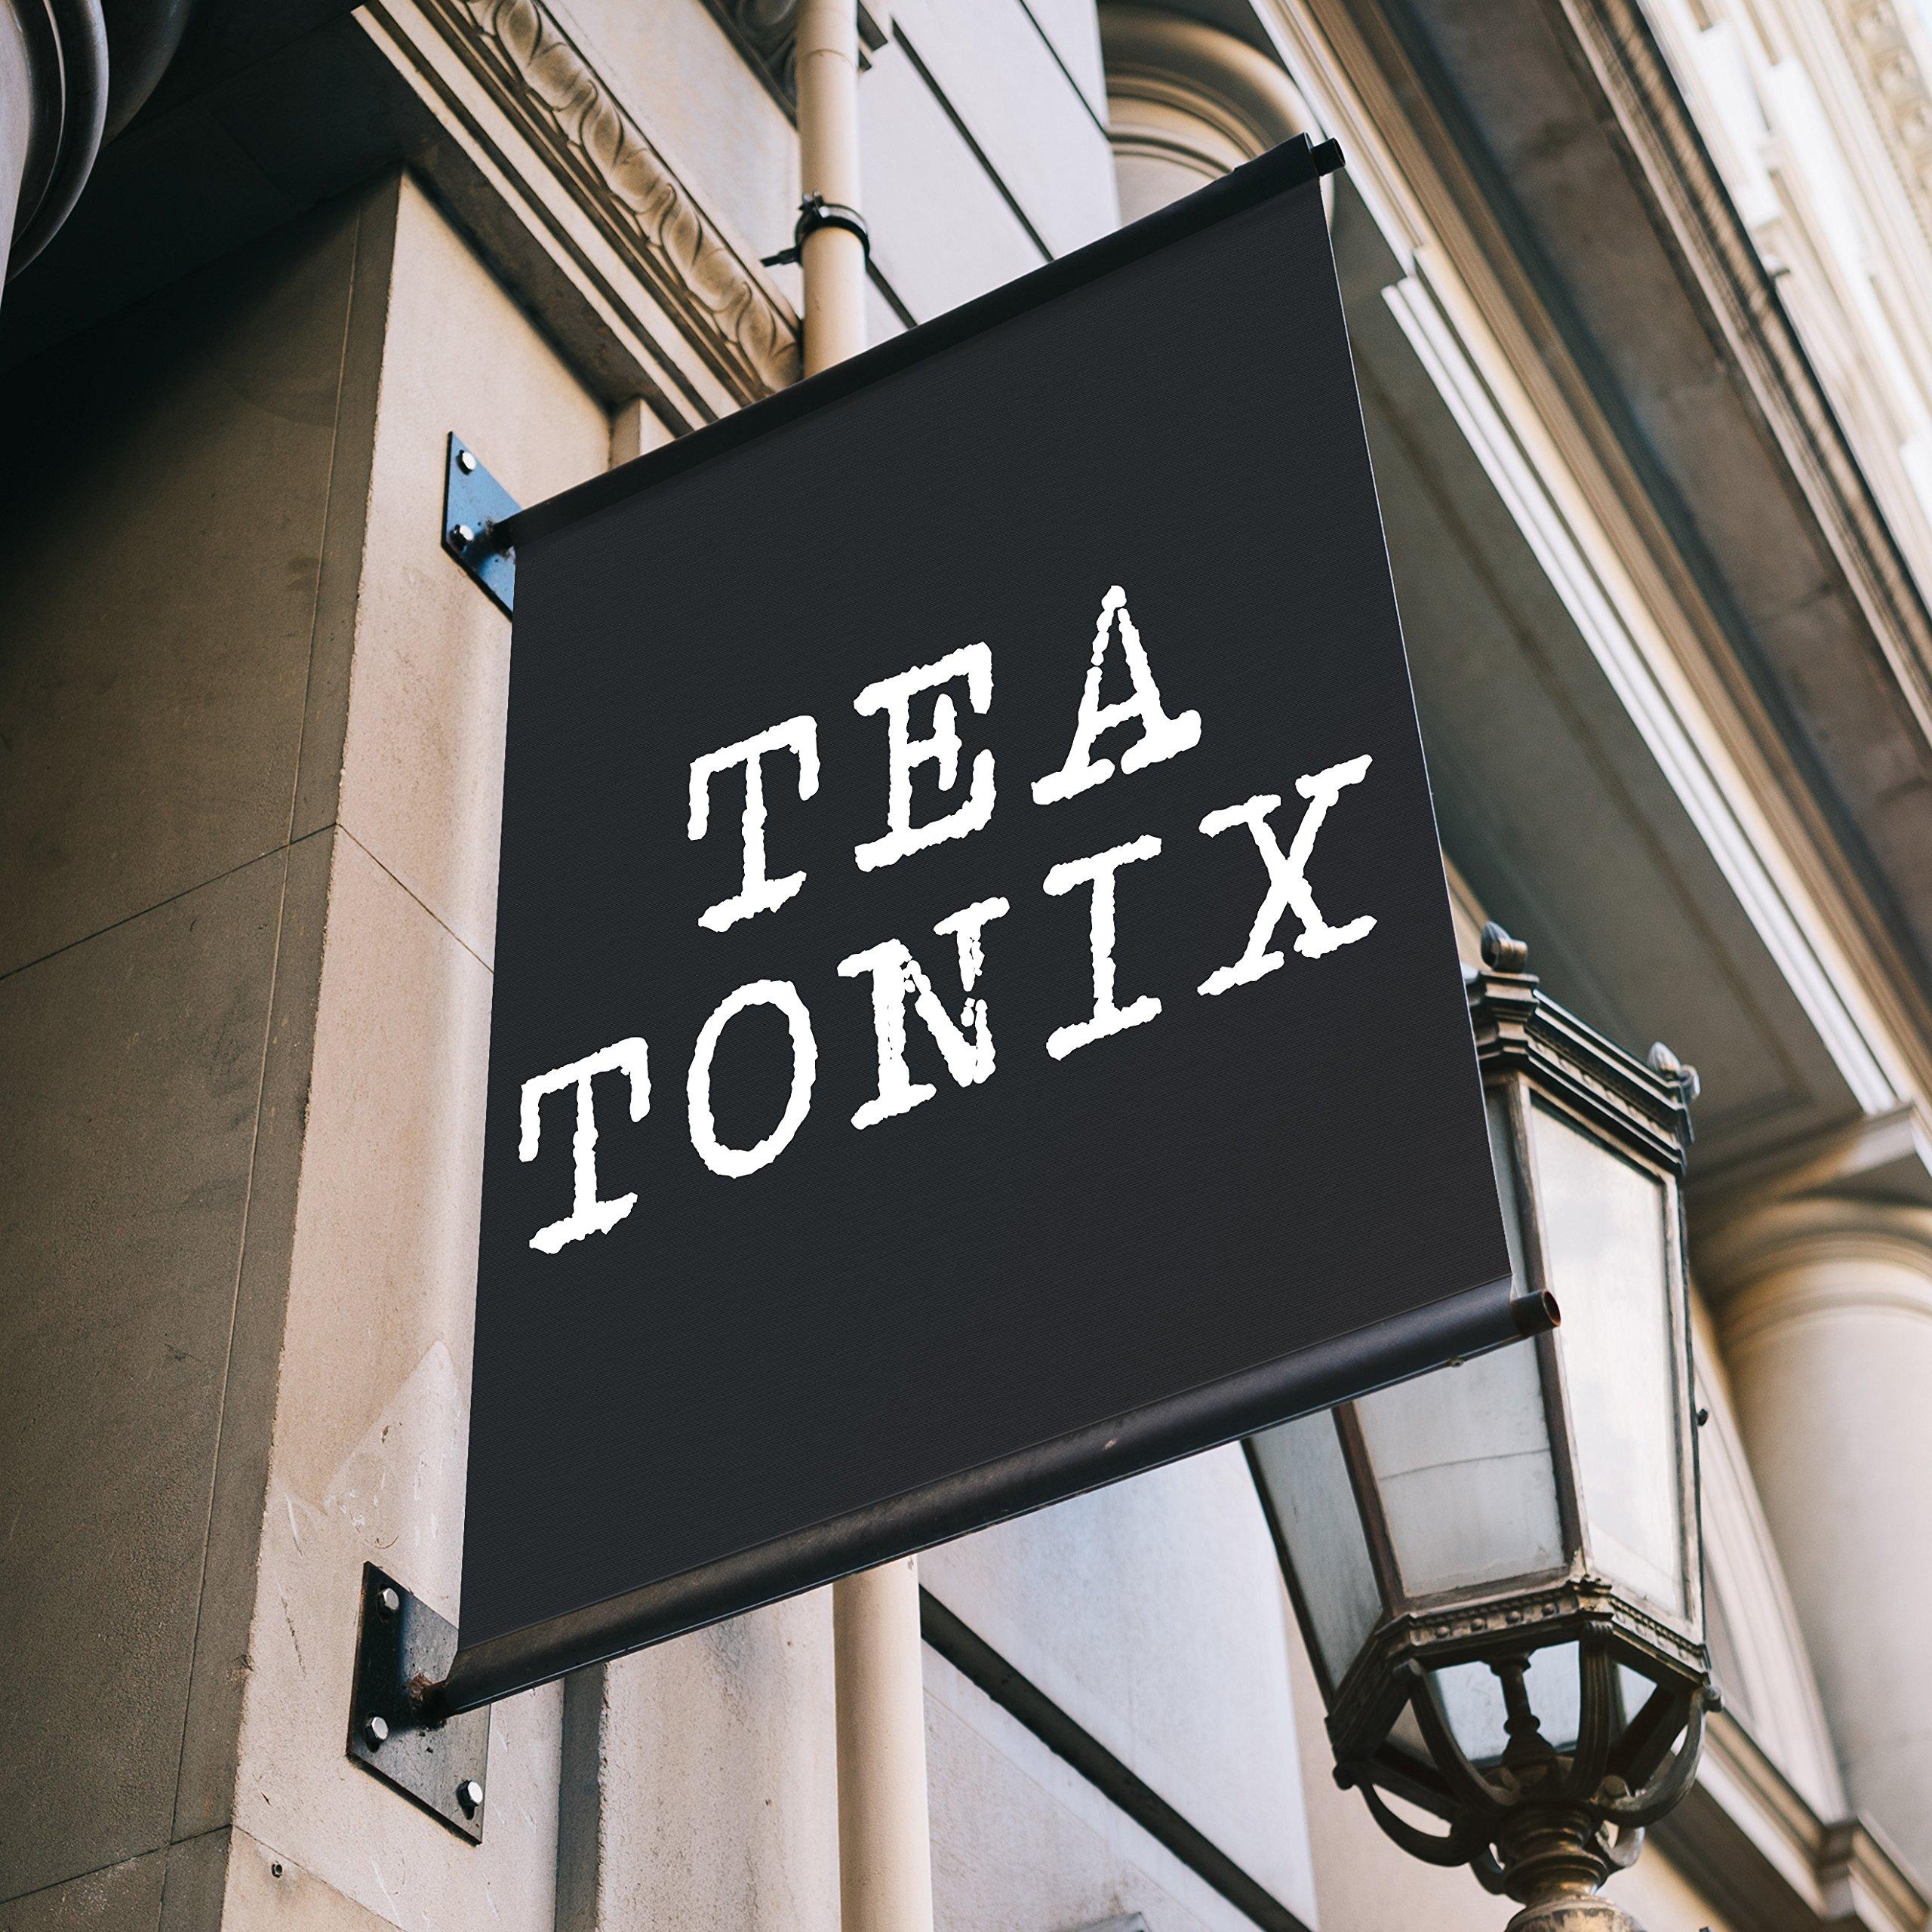 Buy Tonix Now!